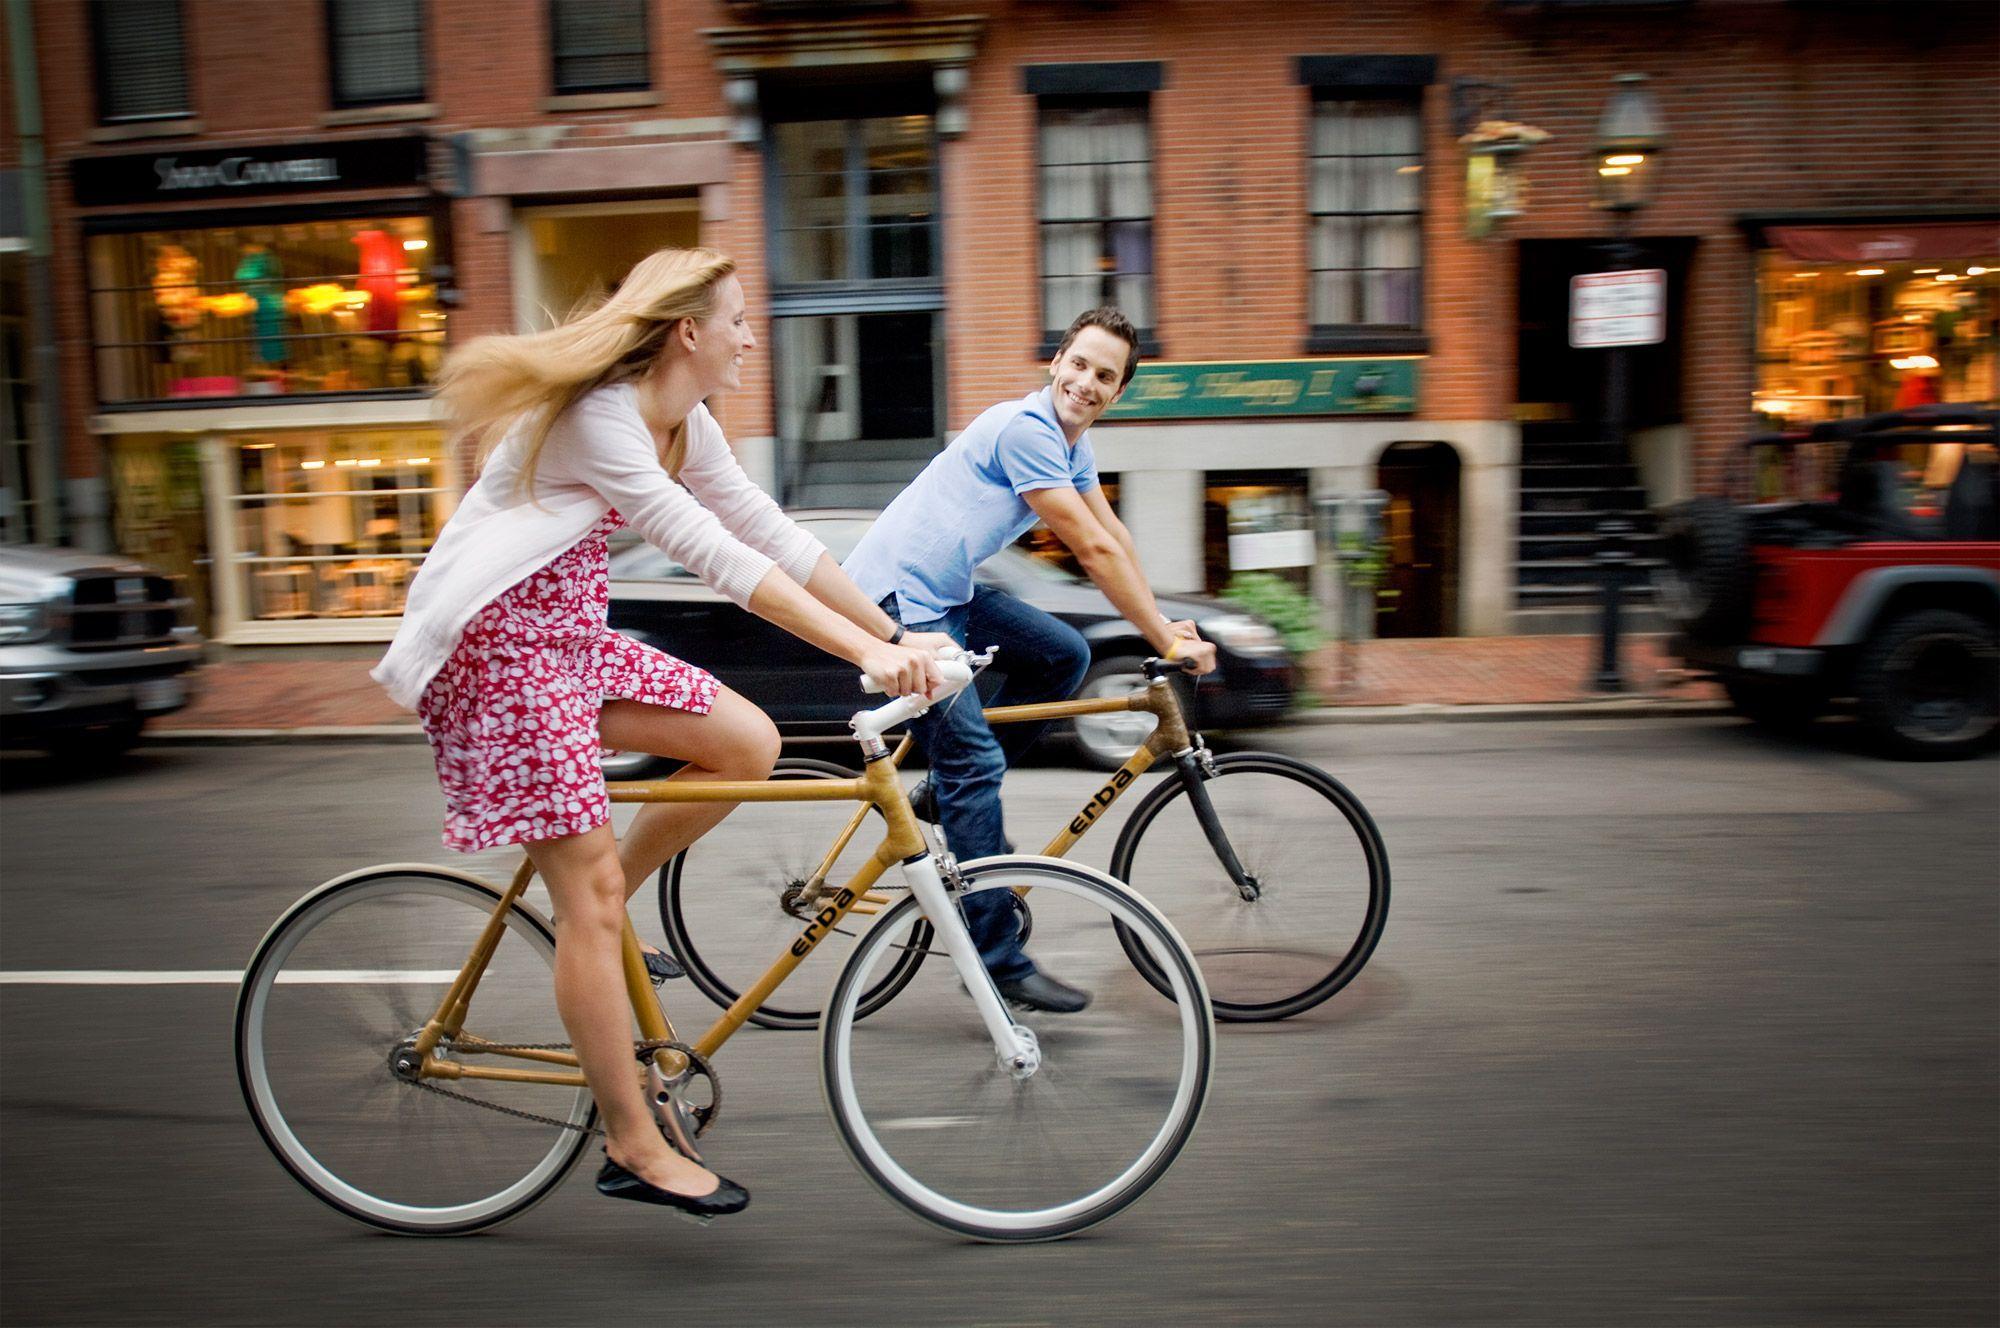 Bikes Bikes Bikes riding bamboo bikes IMG